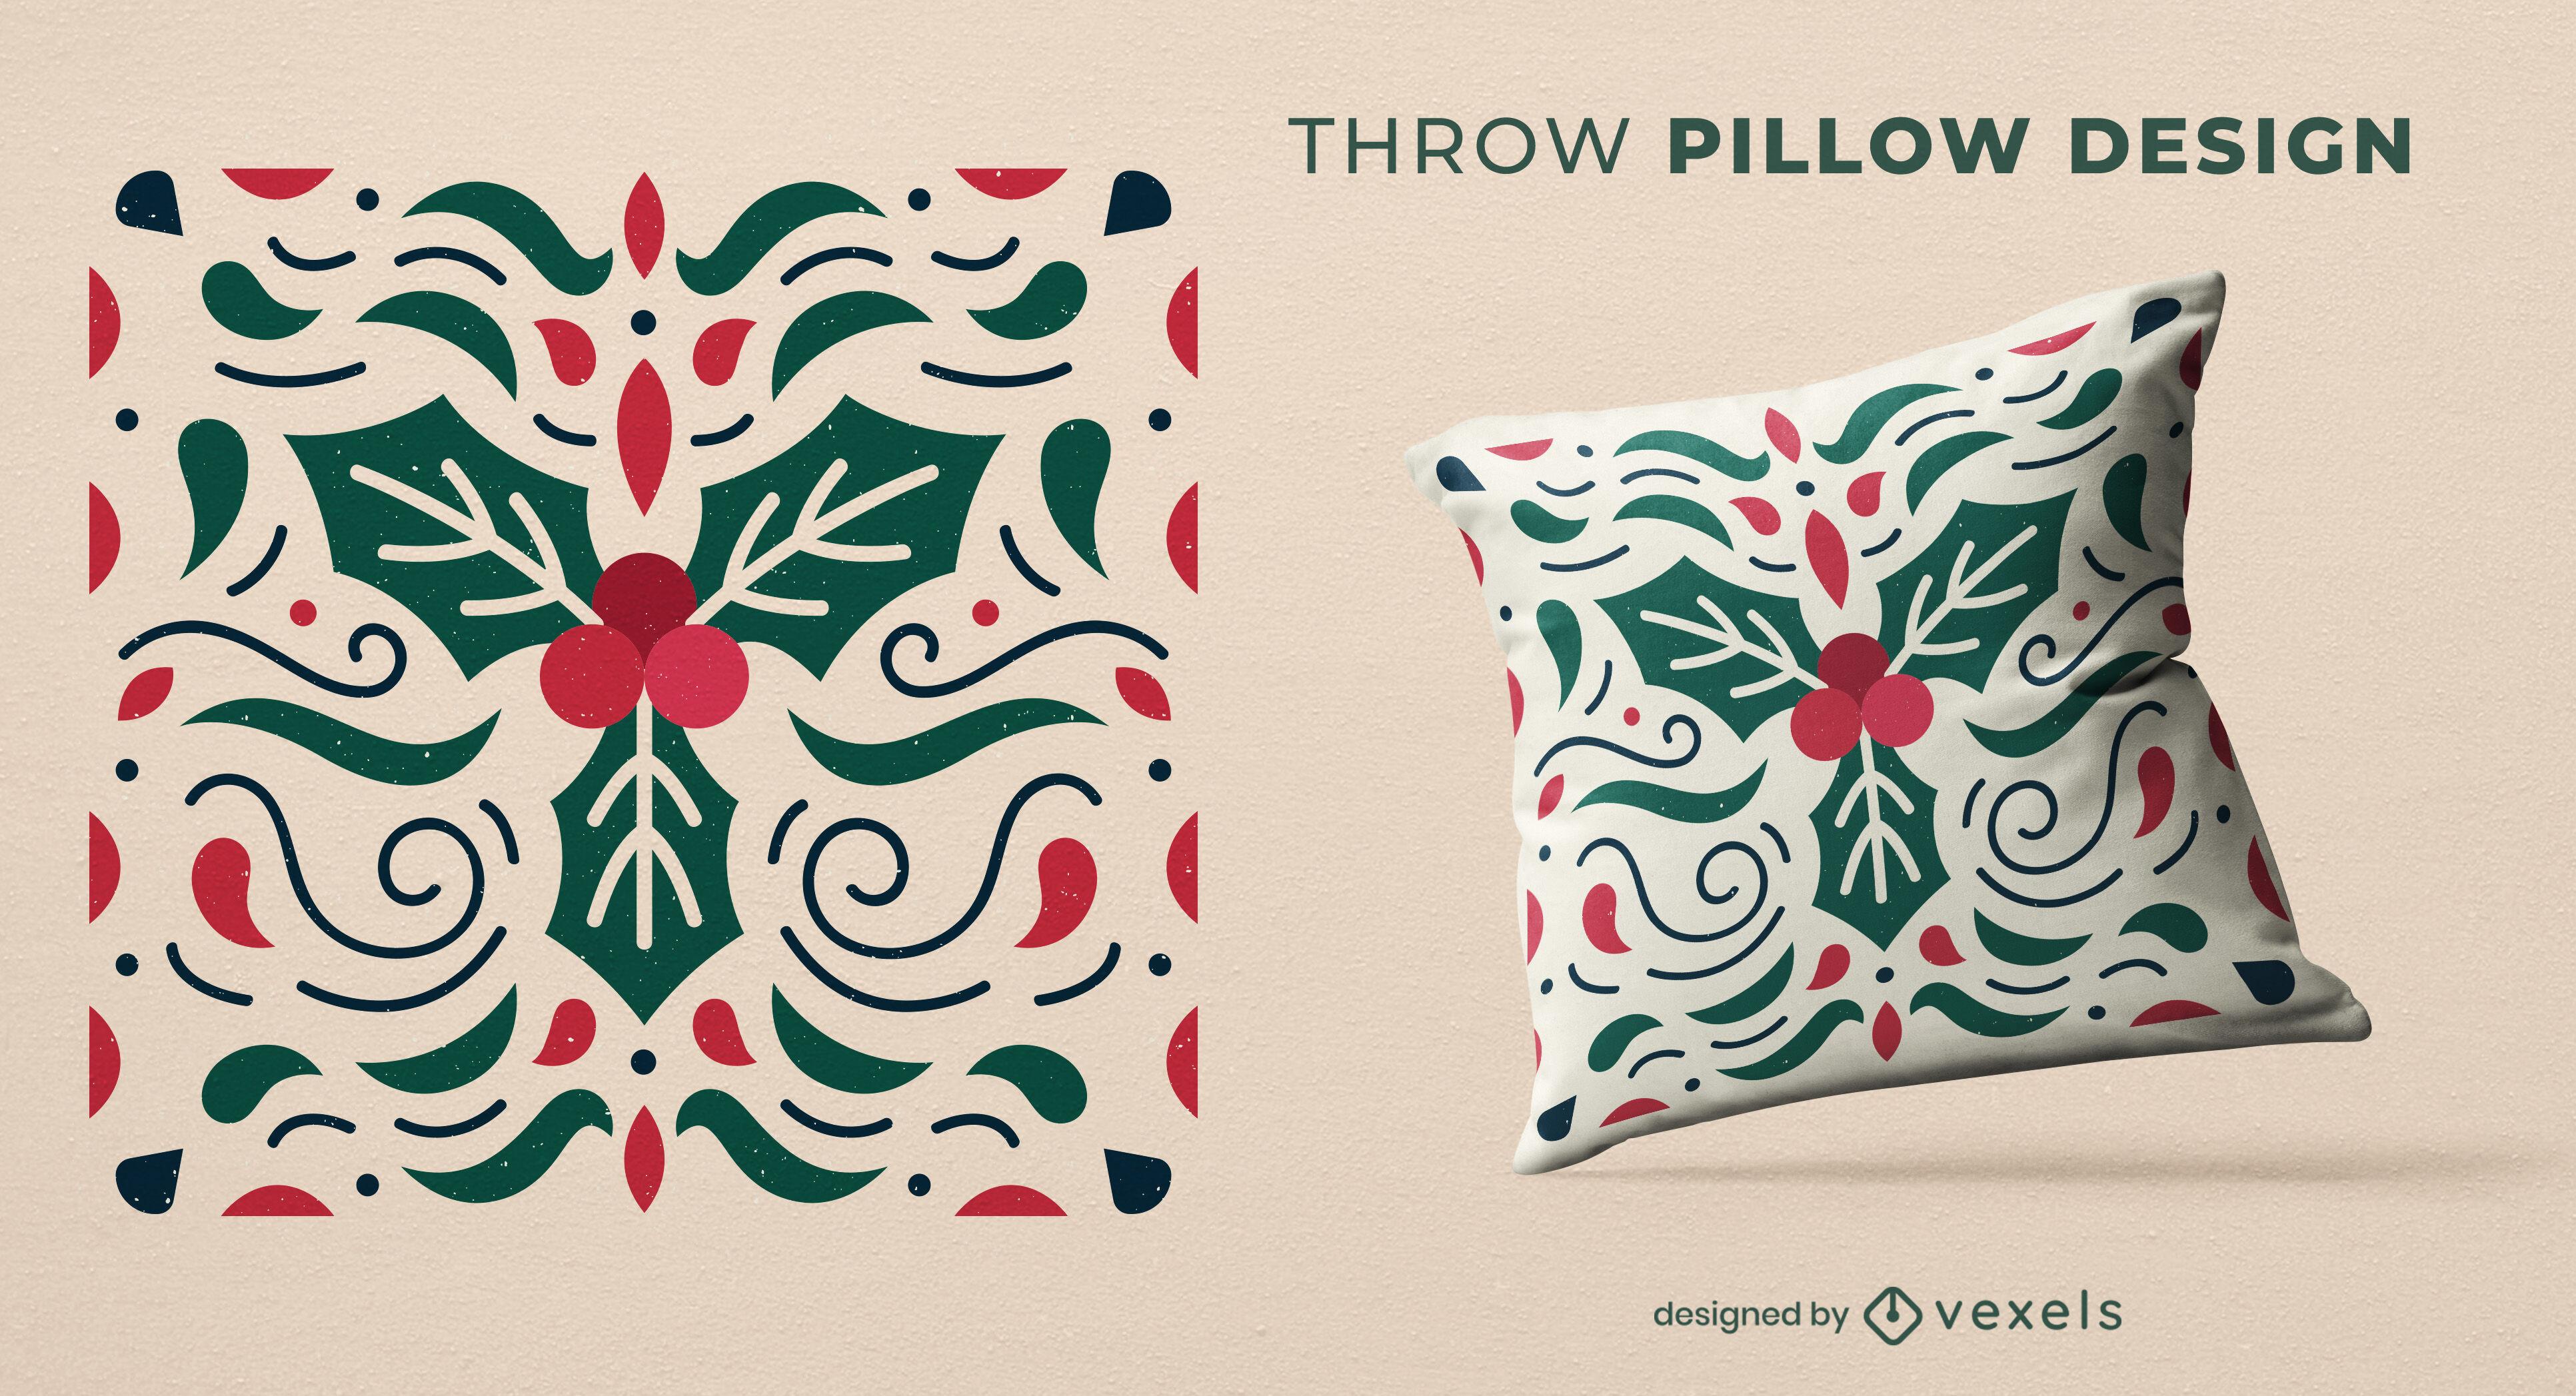 Mistletoe winter throw pillow design